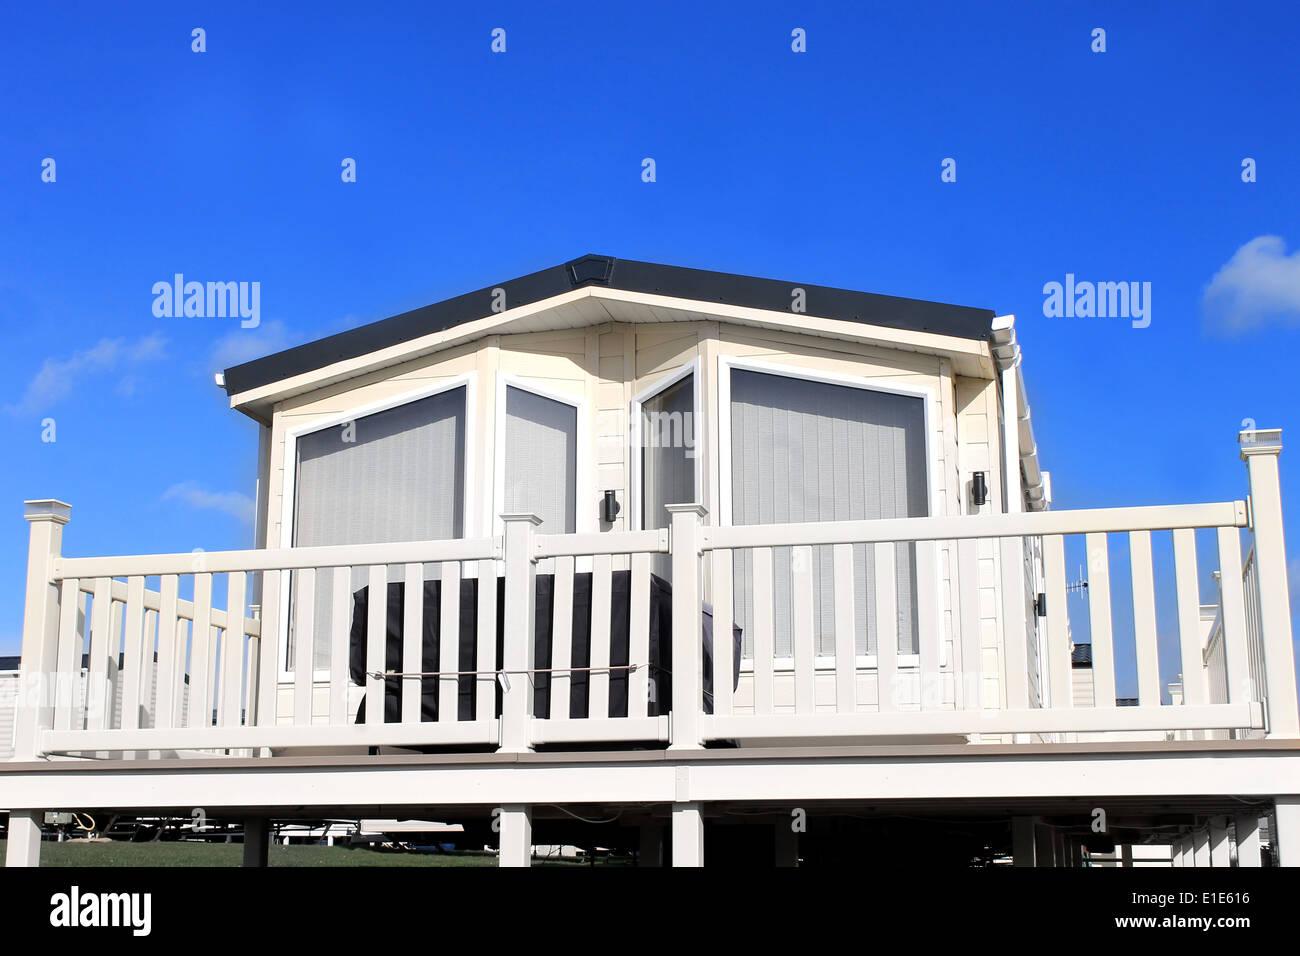 Exterior of caravan on a trailer park in Filey, England. Stock Photo